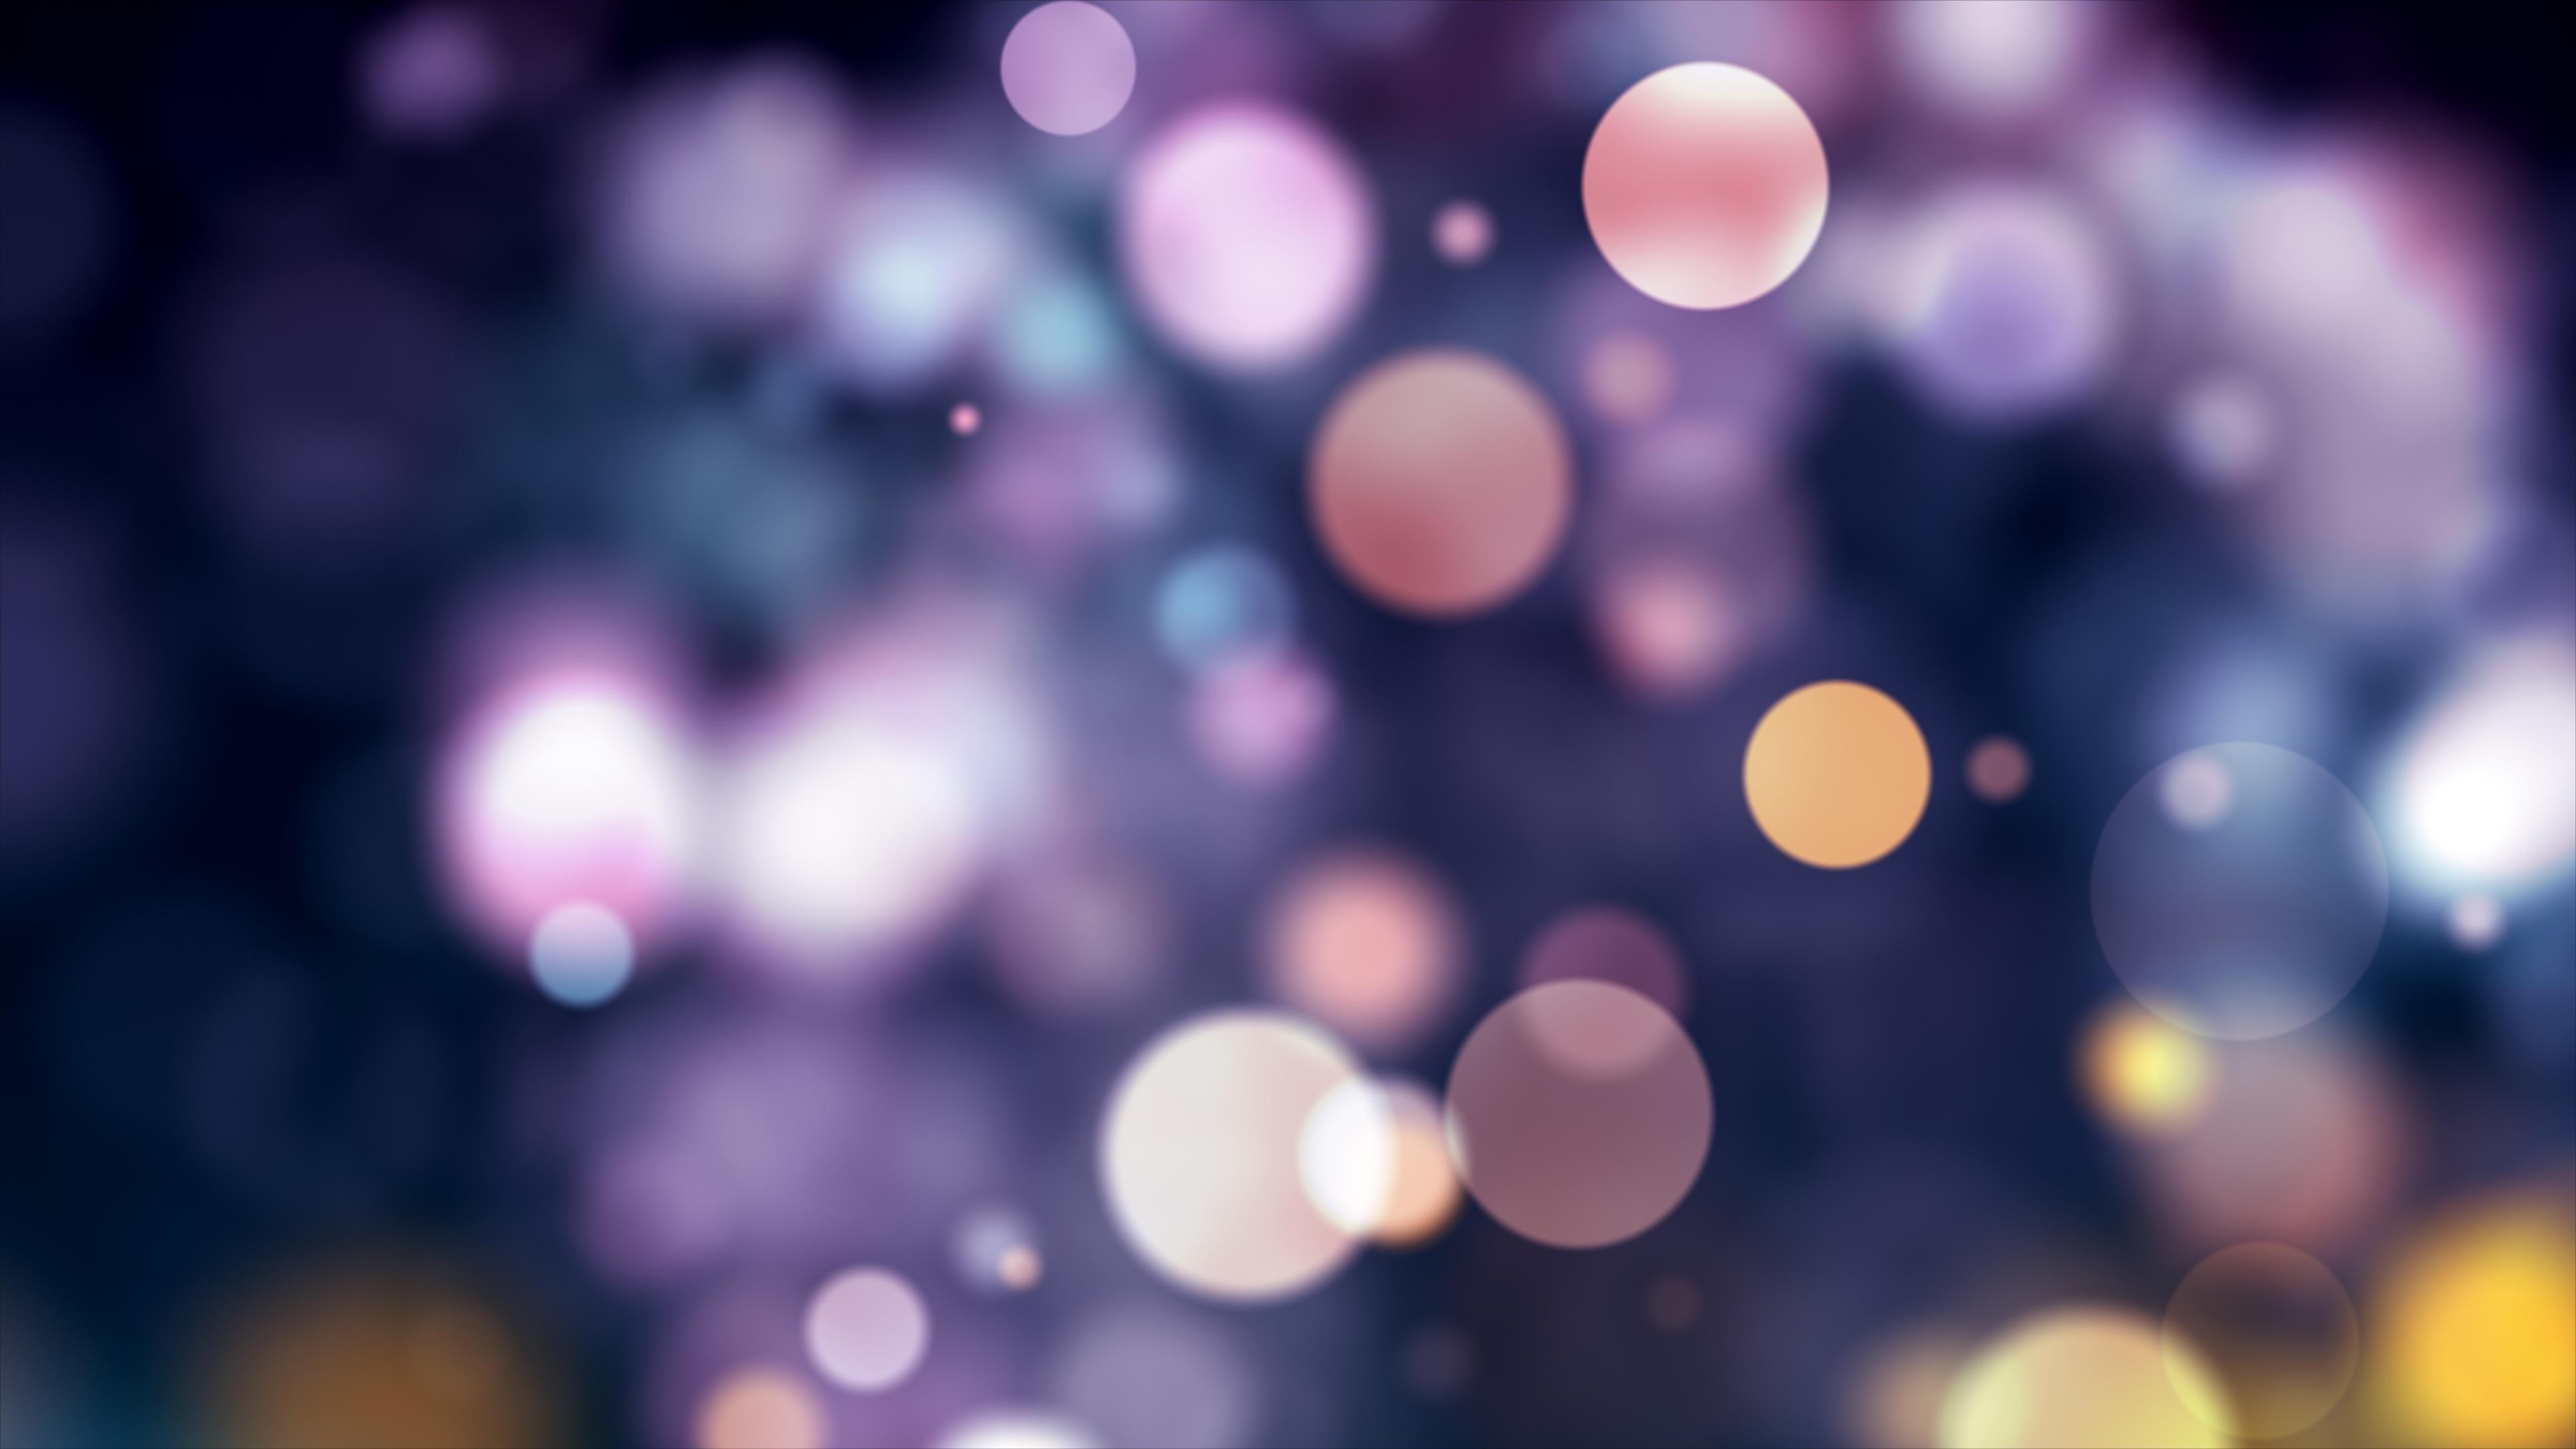 Iphone X Wallpaper Download Hd Kostenloses Foto Zum Thema Beleuchtung Bokeh Hd Wallpaper